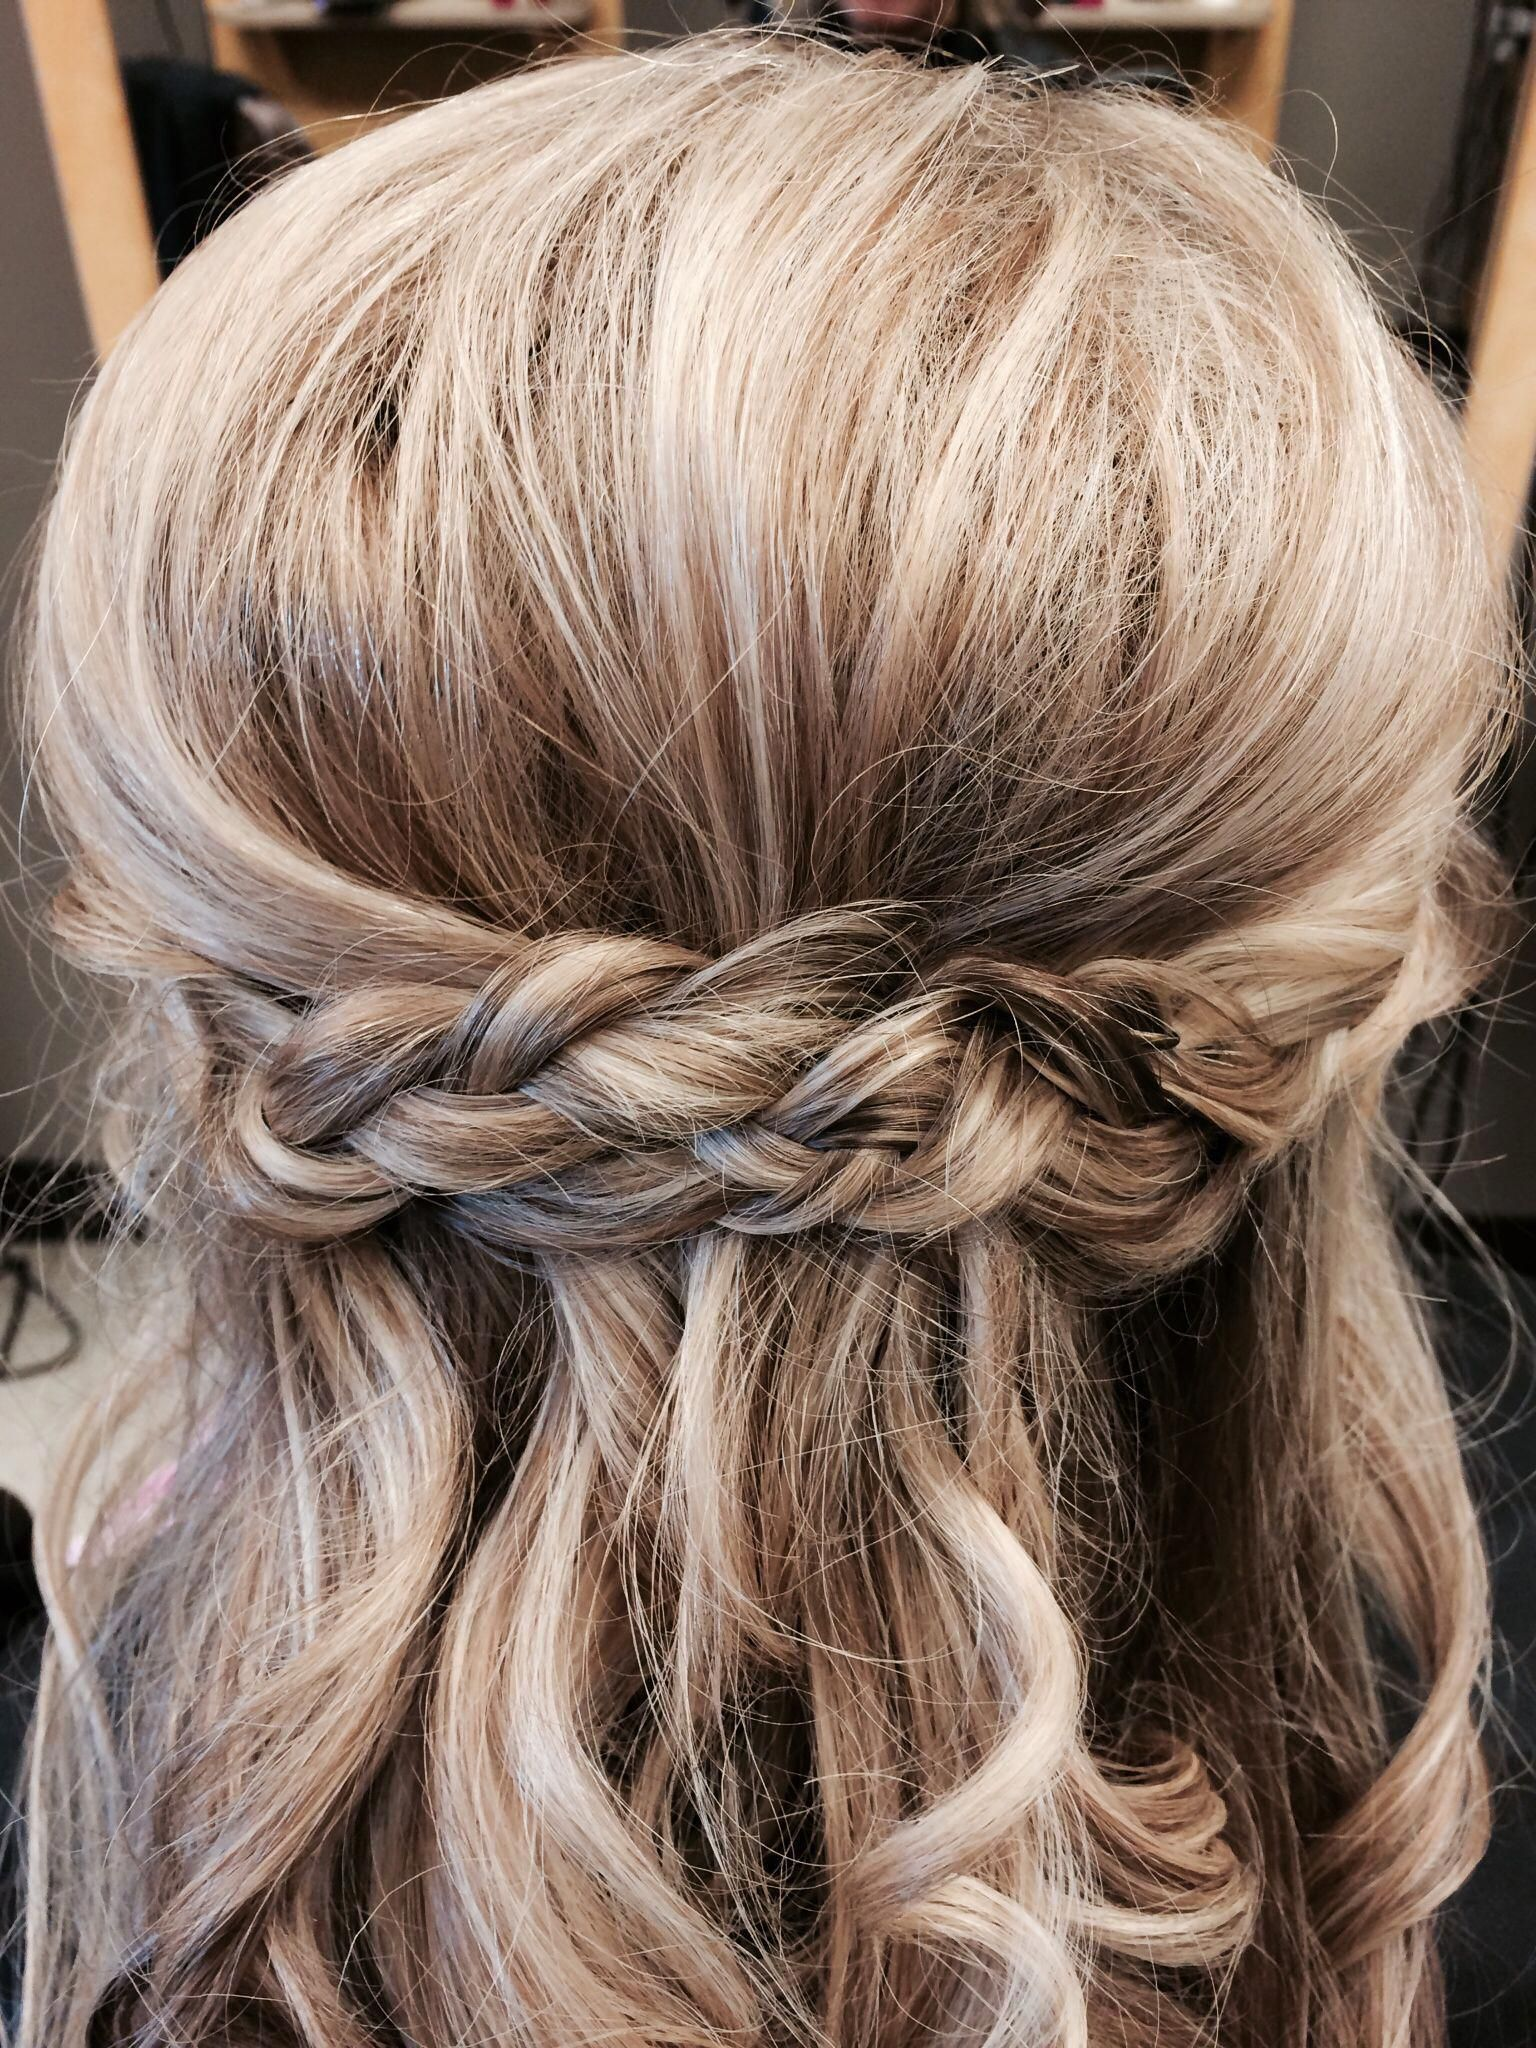 Prom 2014 Half up half down with braids # ...